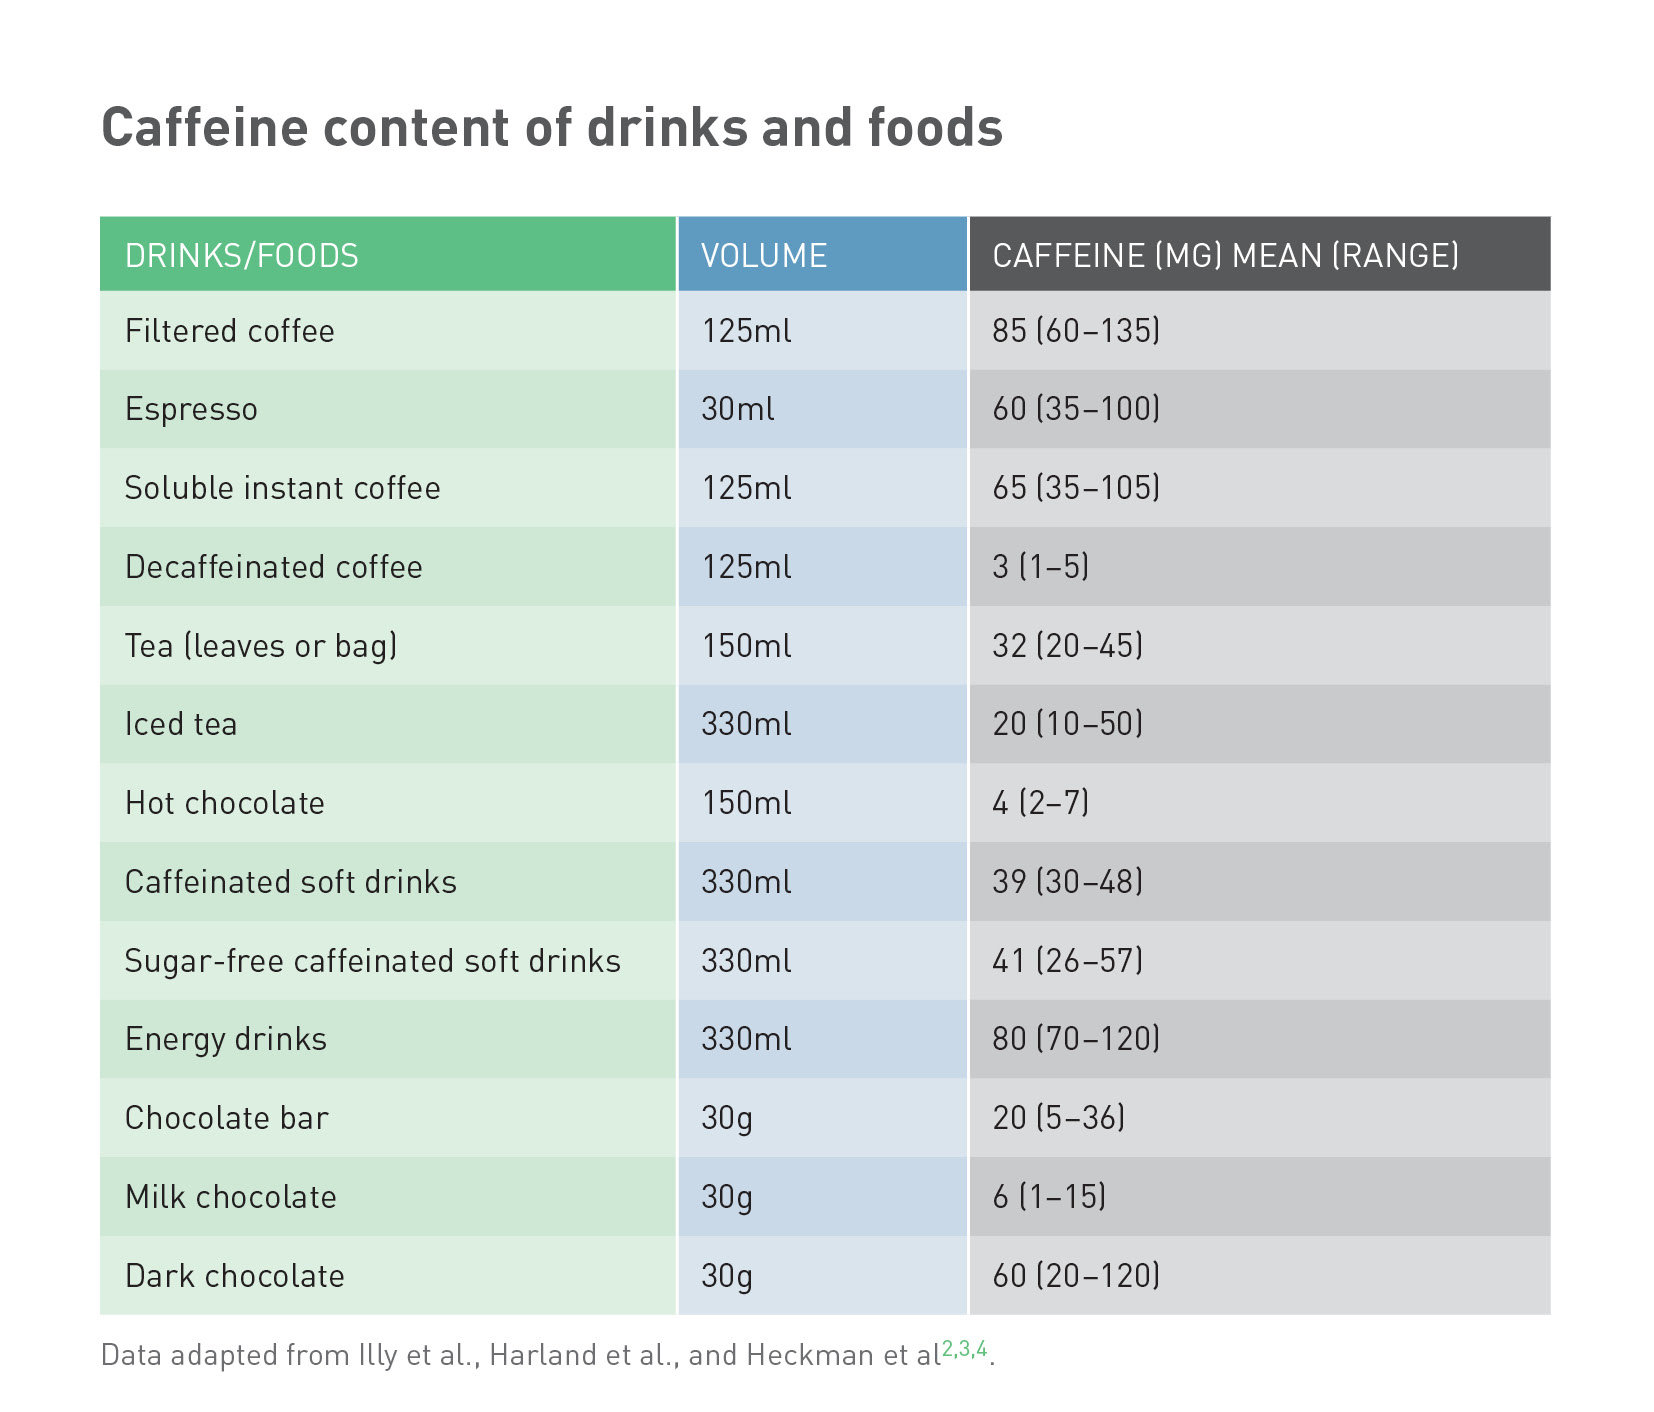 Source: www.coffeeandhealth.org